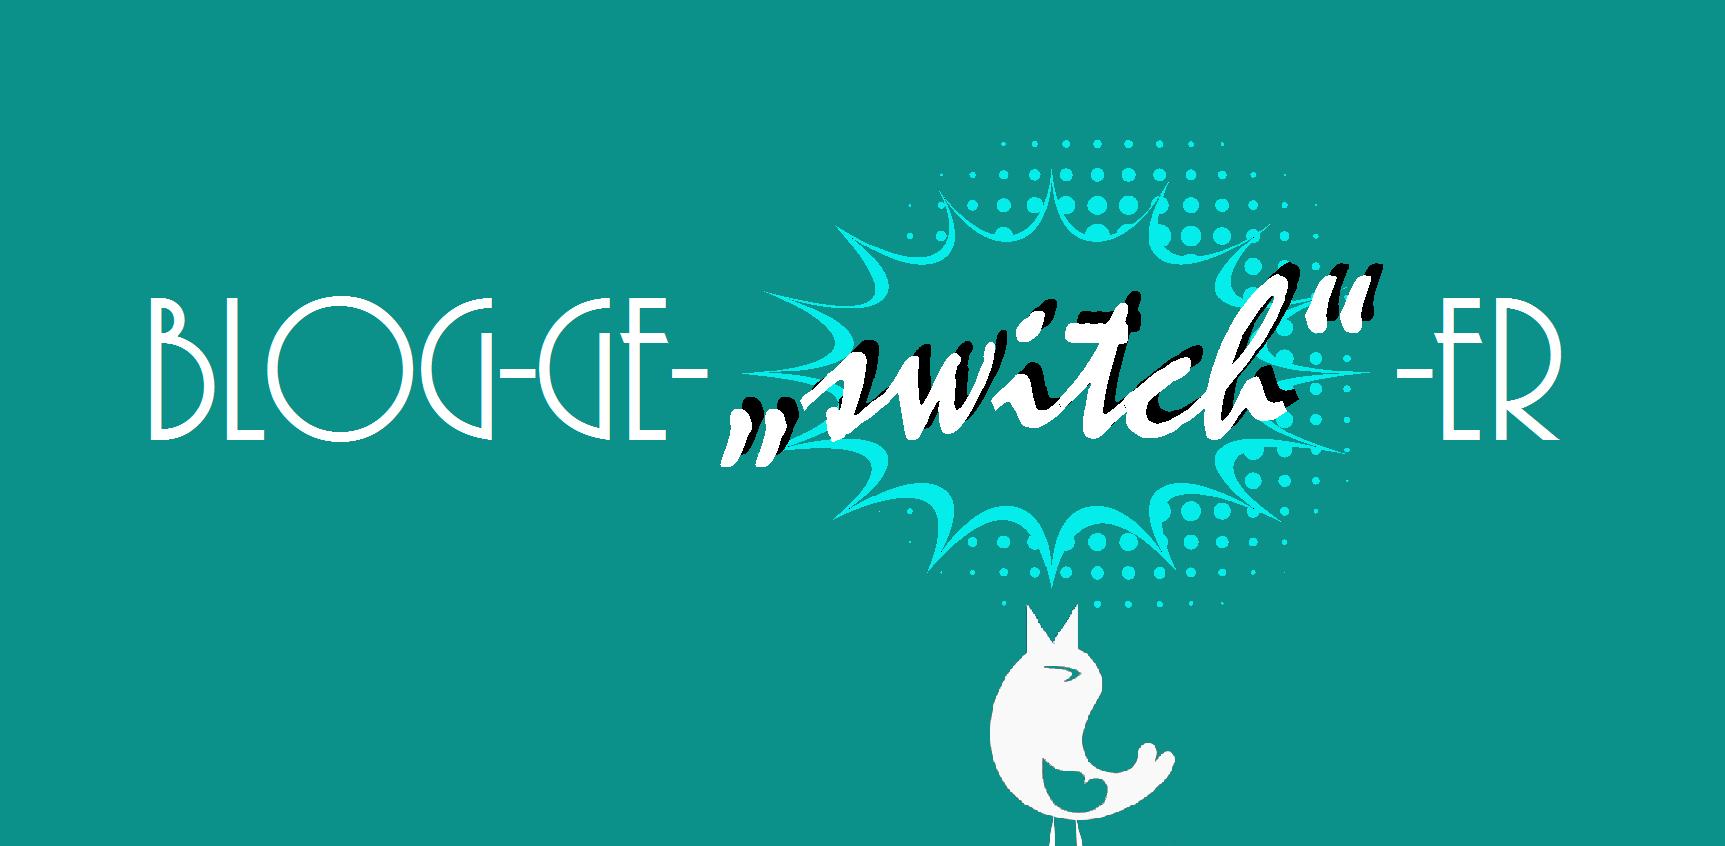 Blog-ge-switch-er